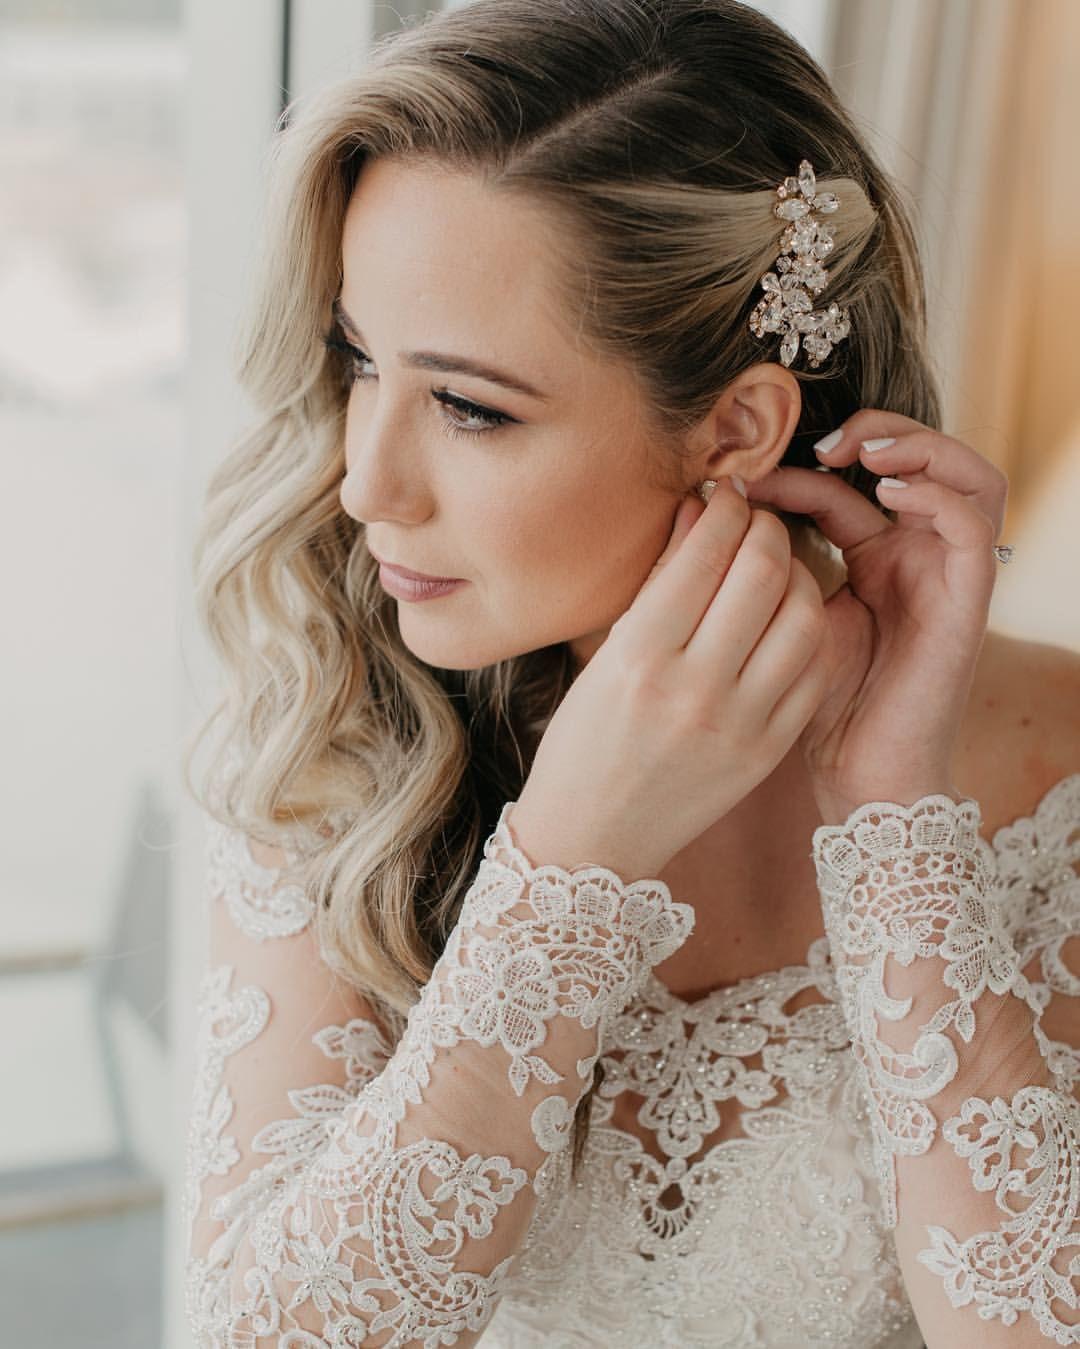 Bridal Makeup And Side Swept Curls Wedding Hair Side Bridal Hair Side Swept Wedding Hair Down